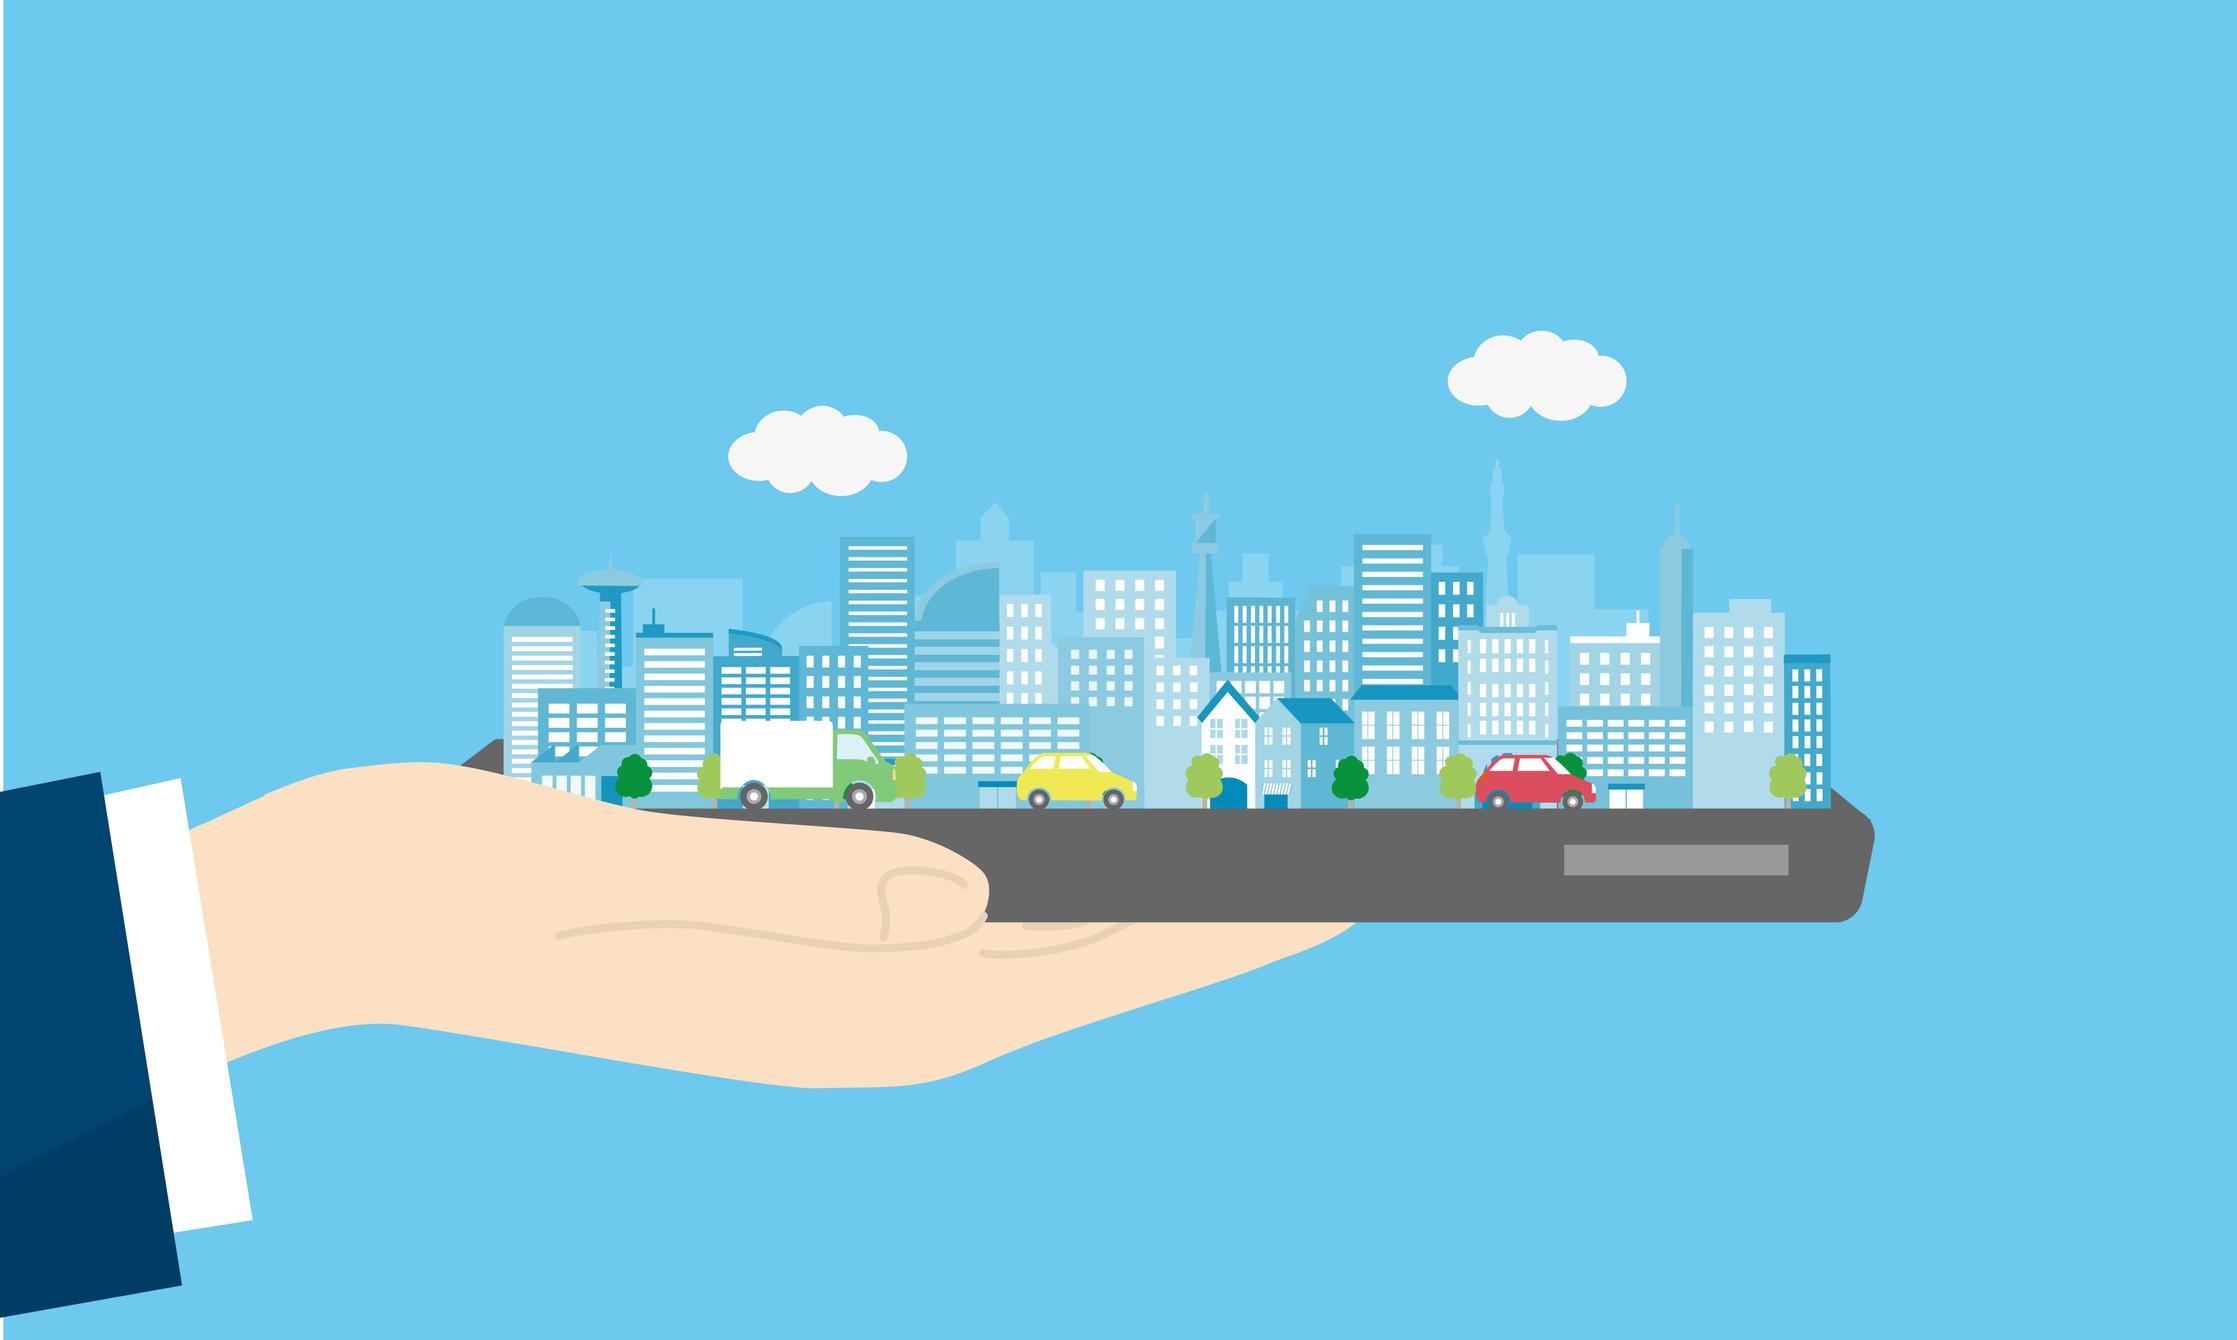 Illustration of city sharing information. Image credit: iStock